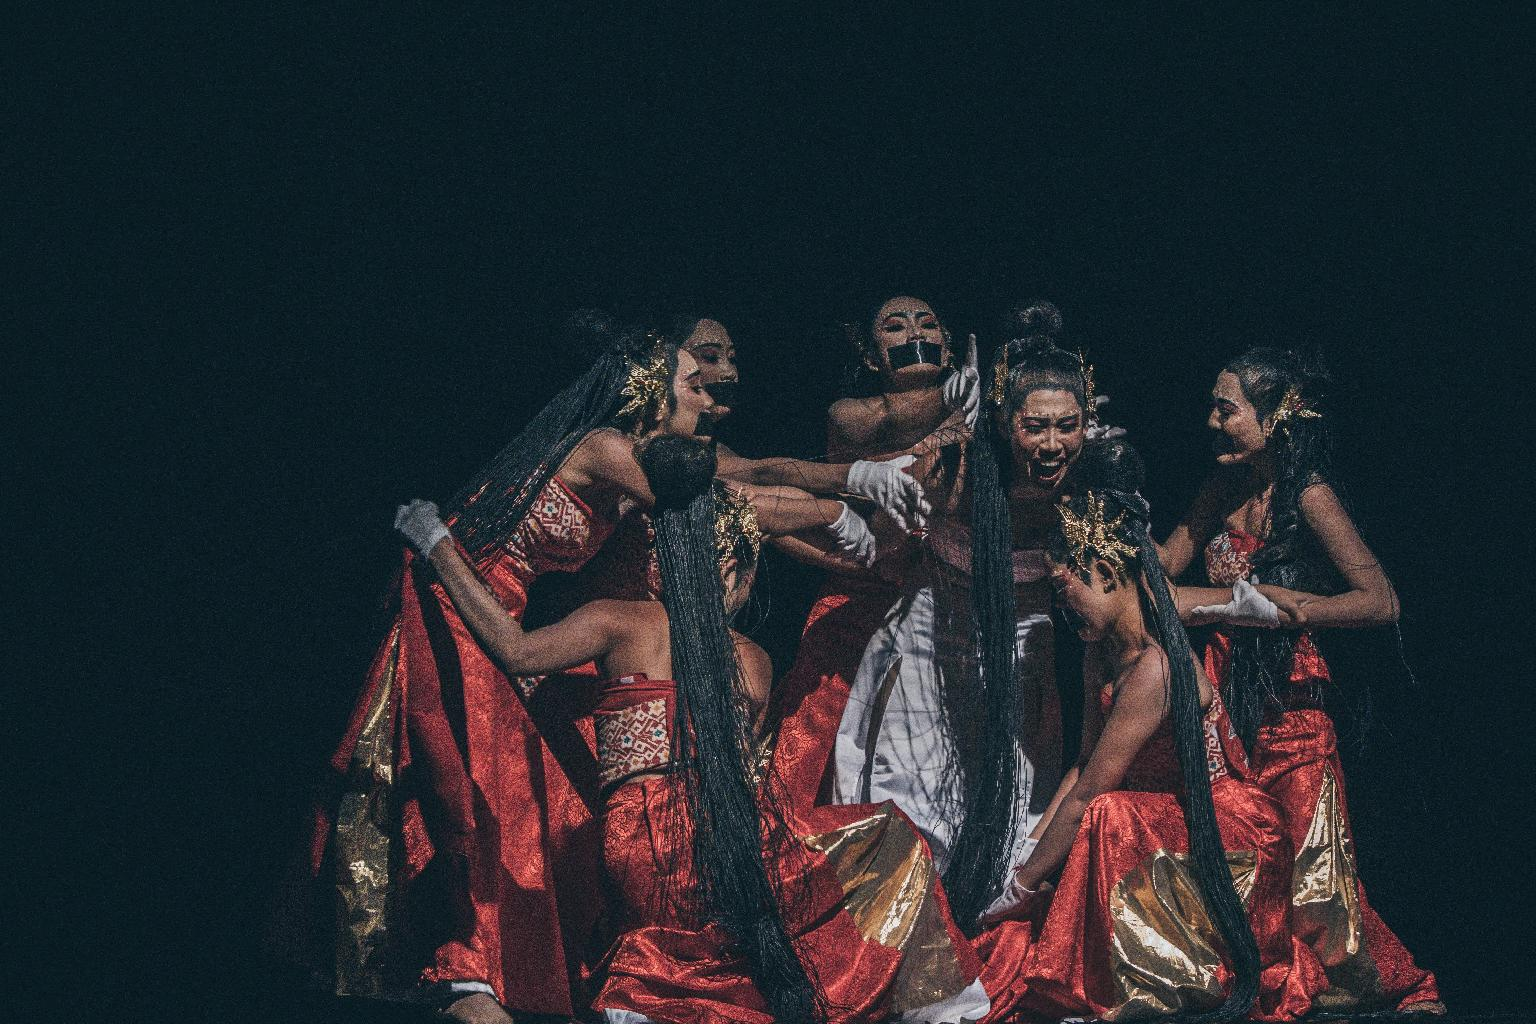 Berita - Cakrawala Yogyakarta, Sebuah Pementasan Sastra dengan Gaya Baru